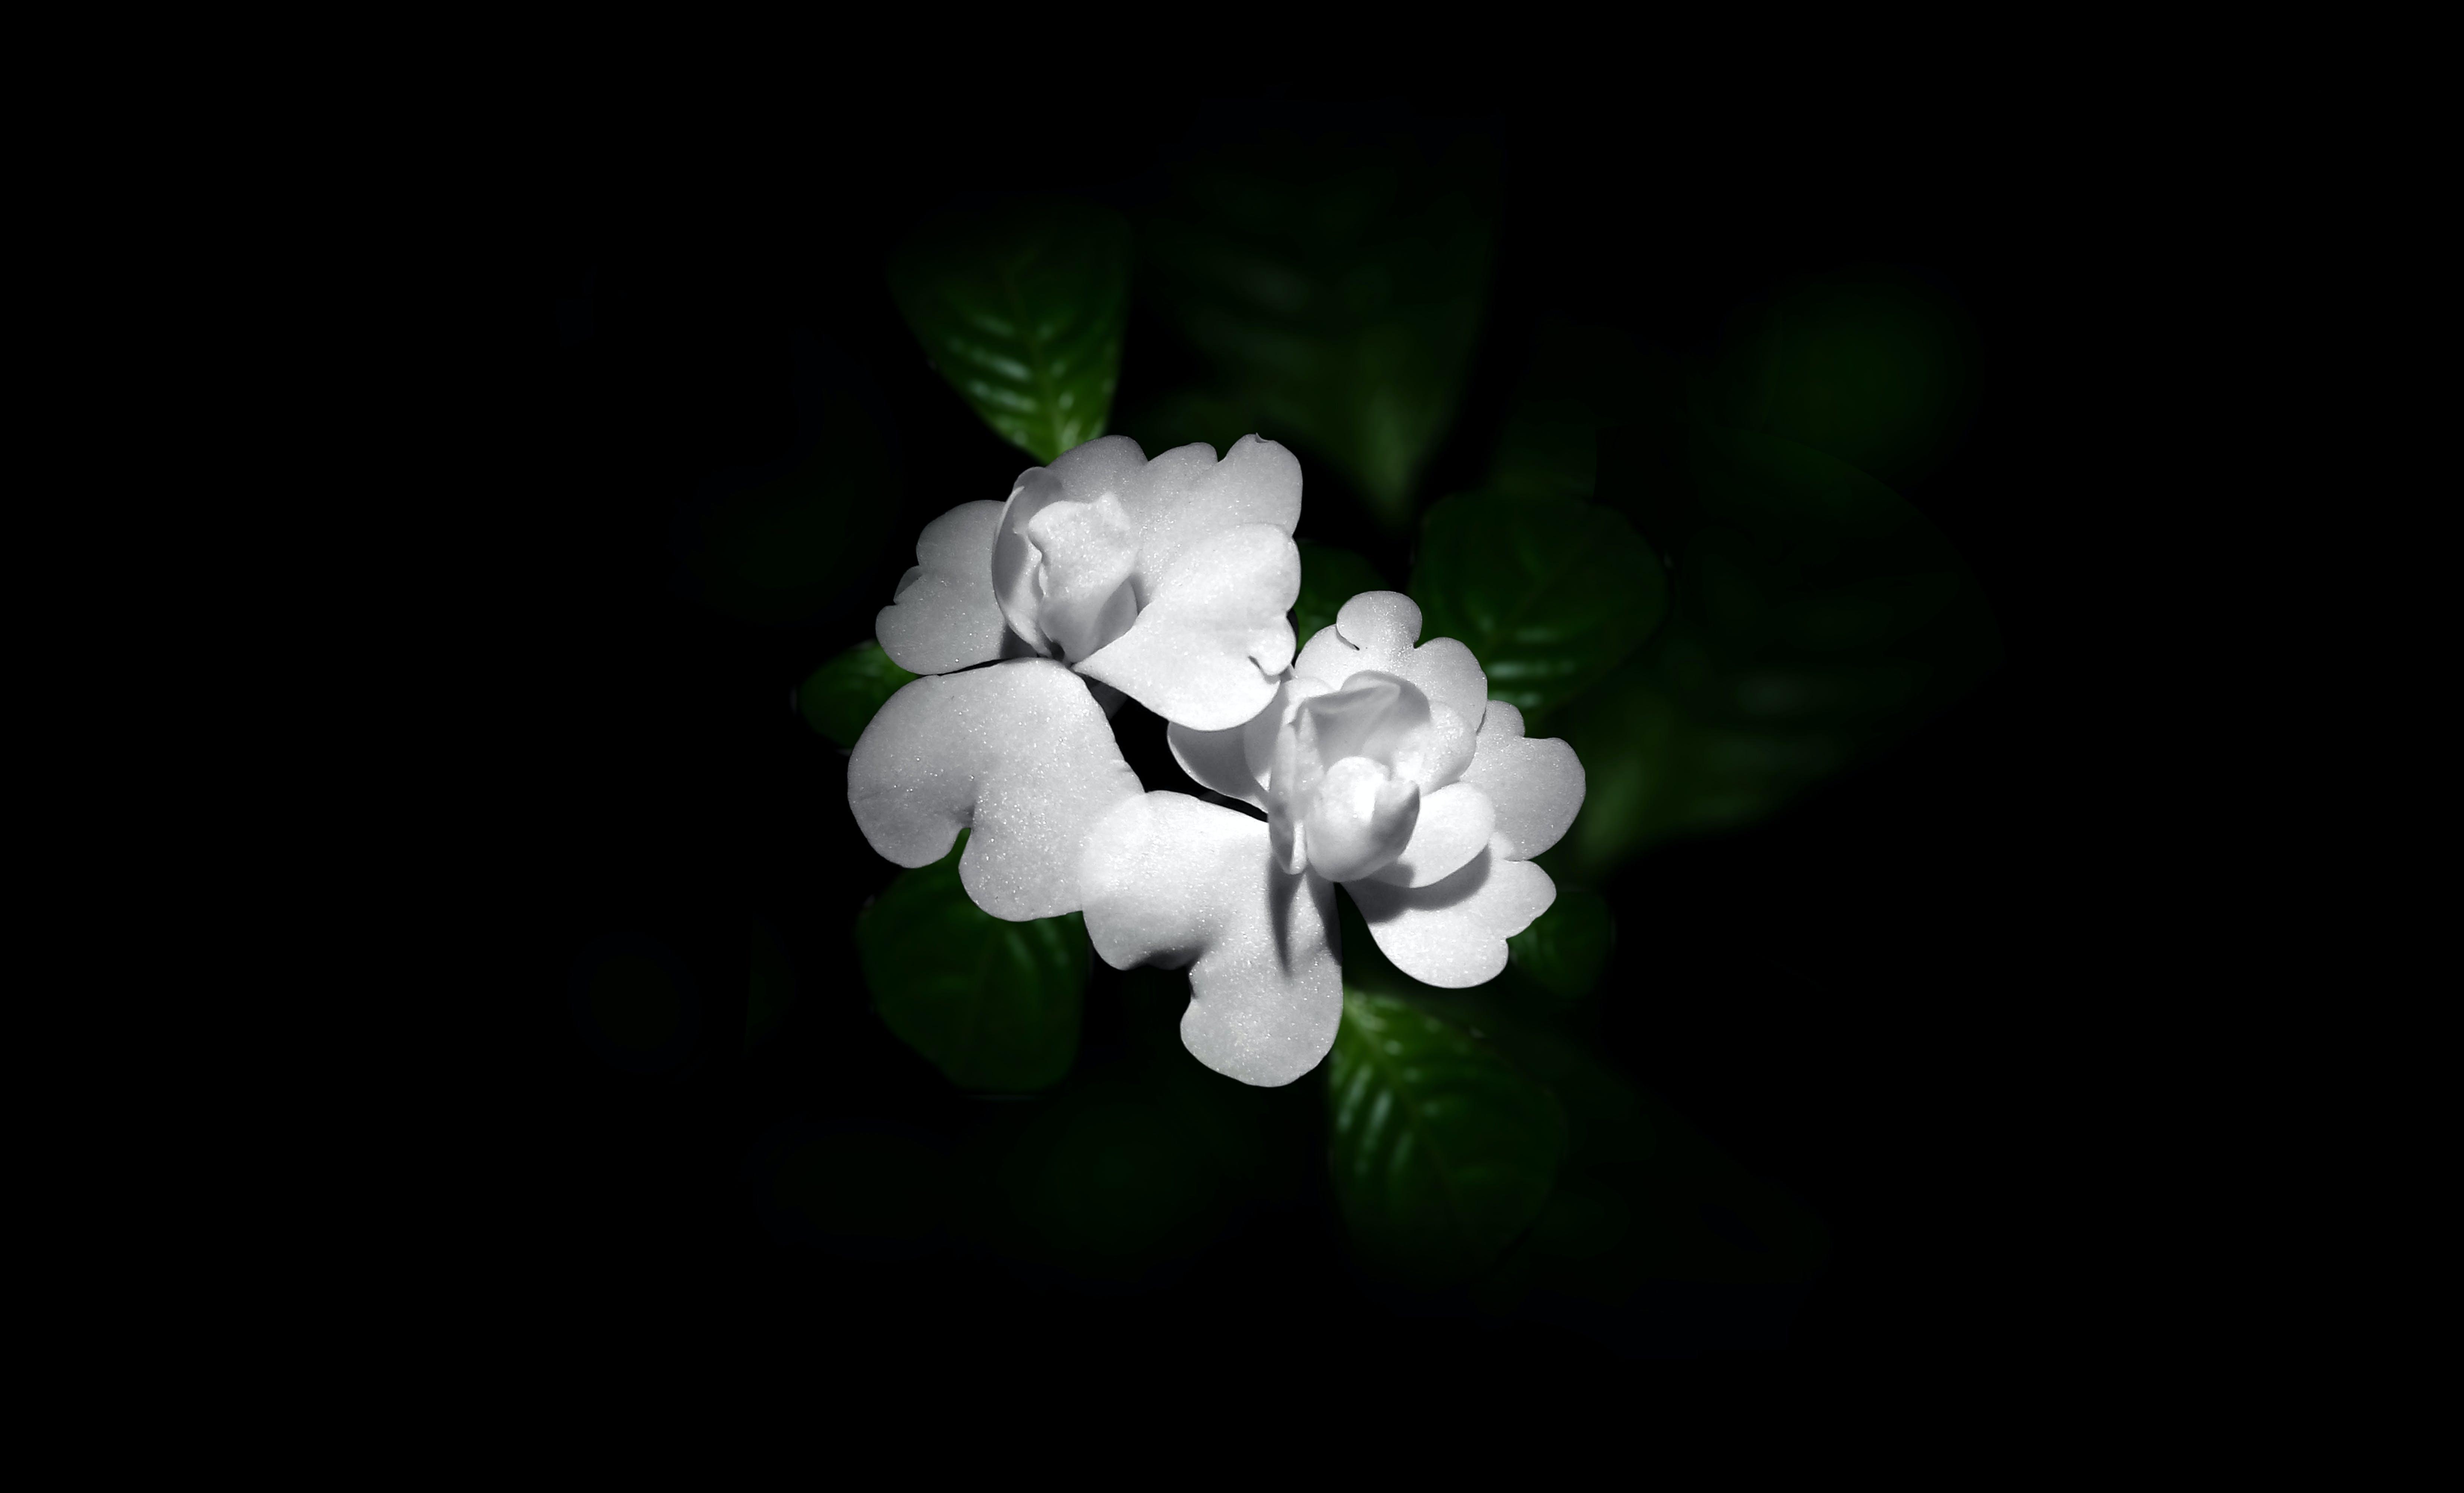 Free stock photo of darkness, night, night photography, white flower